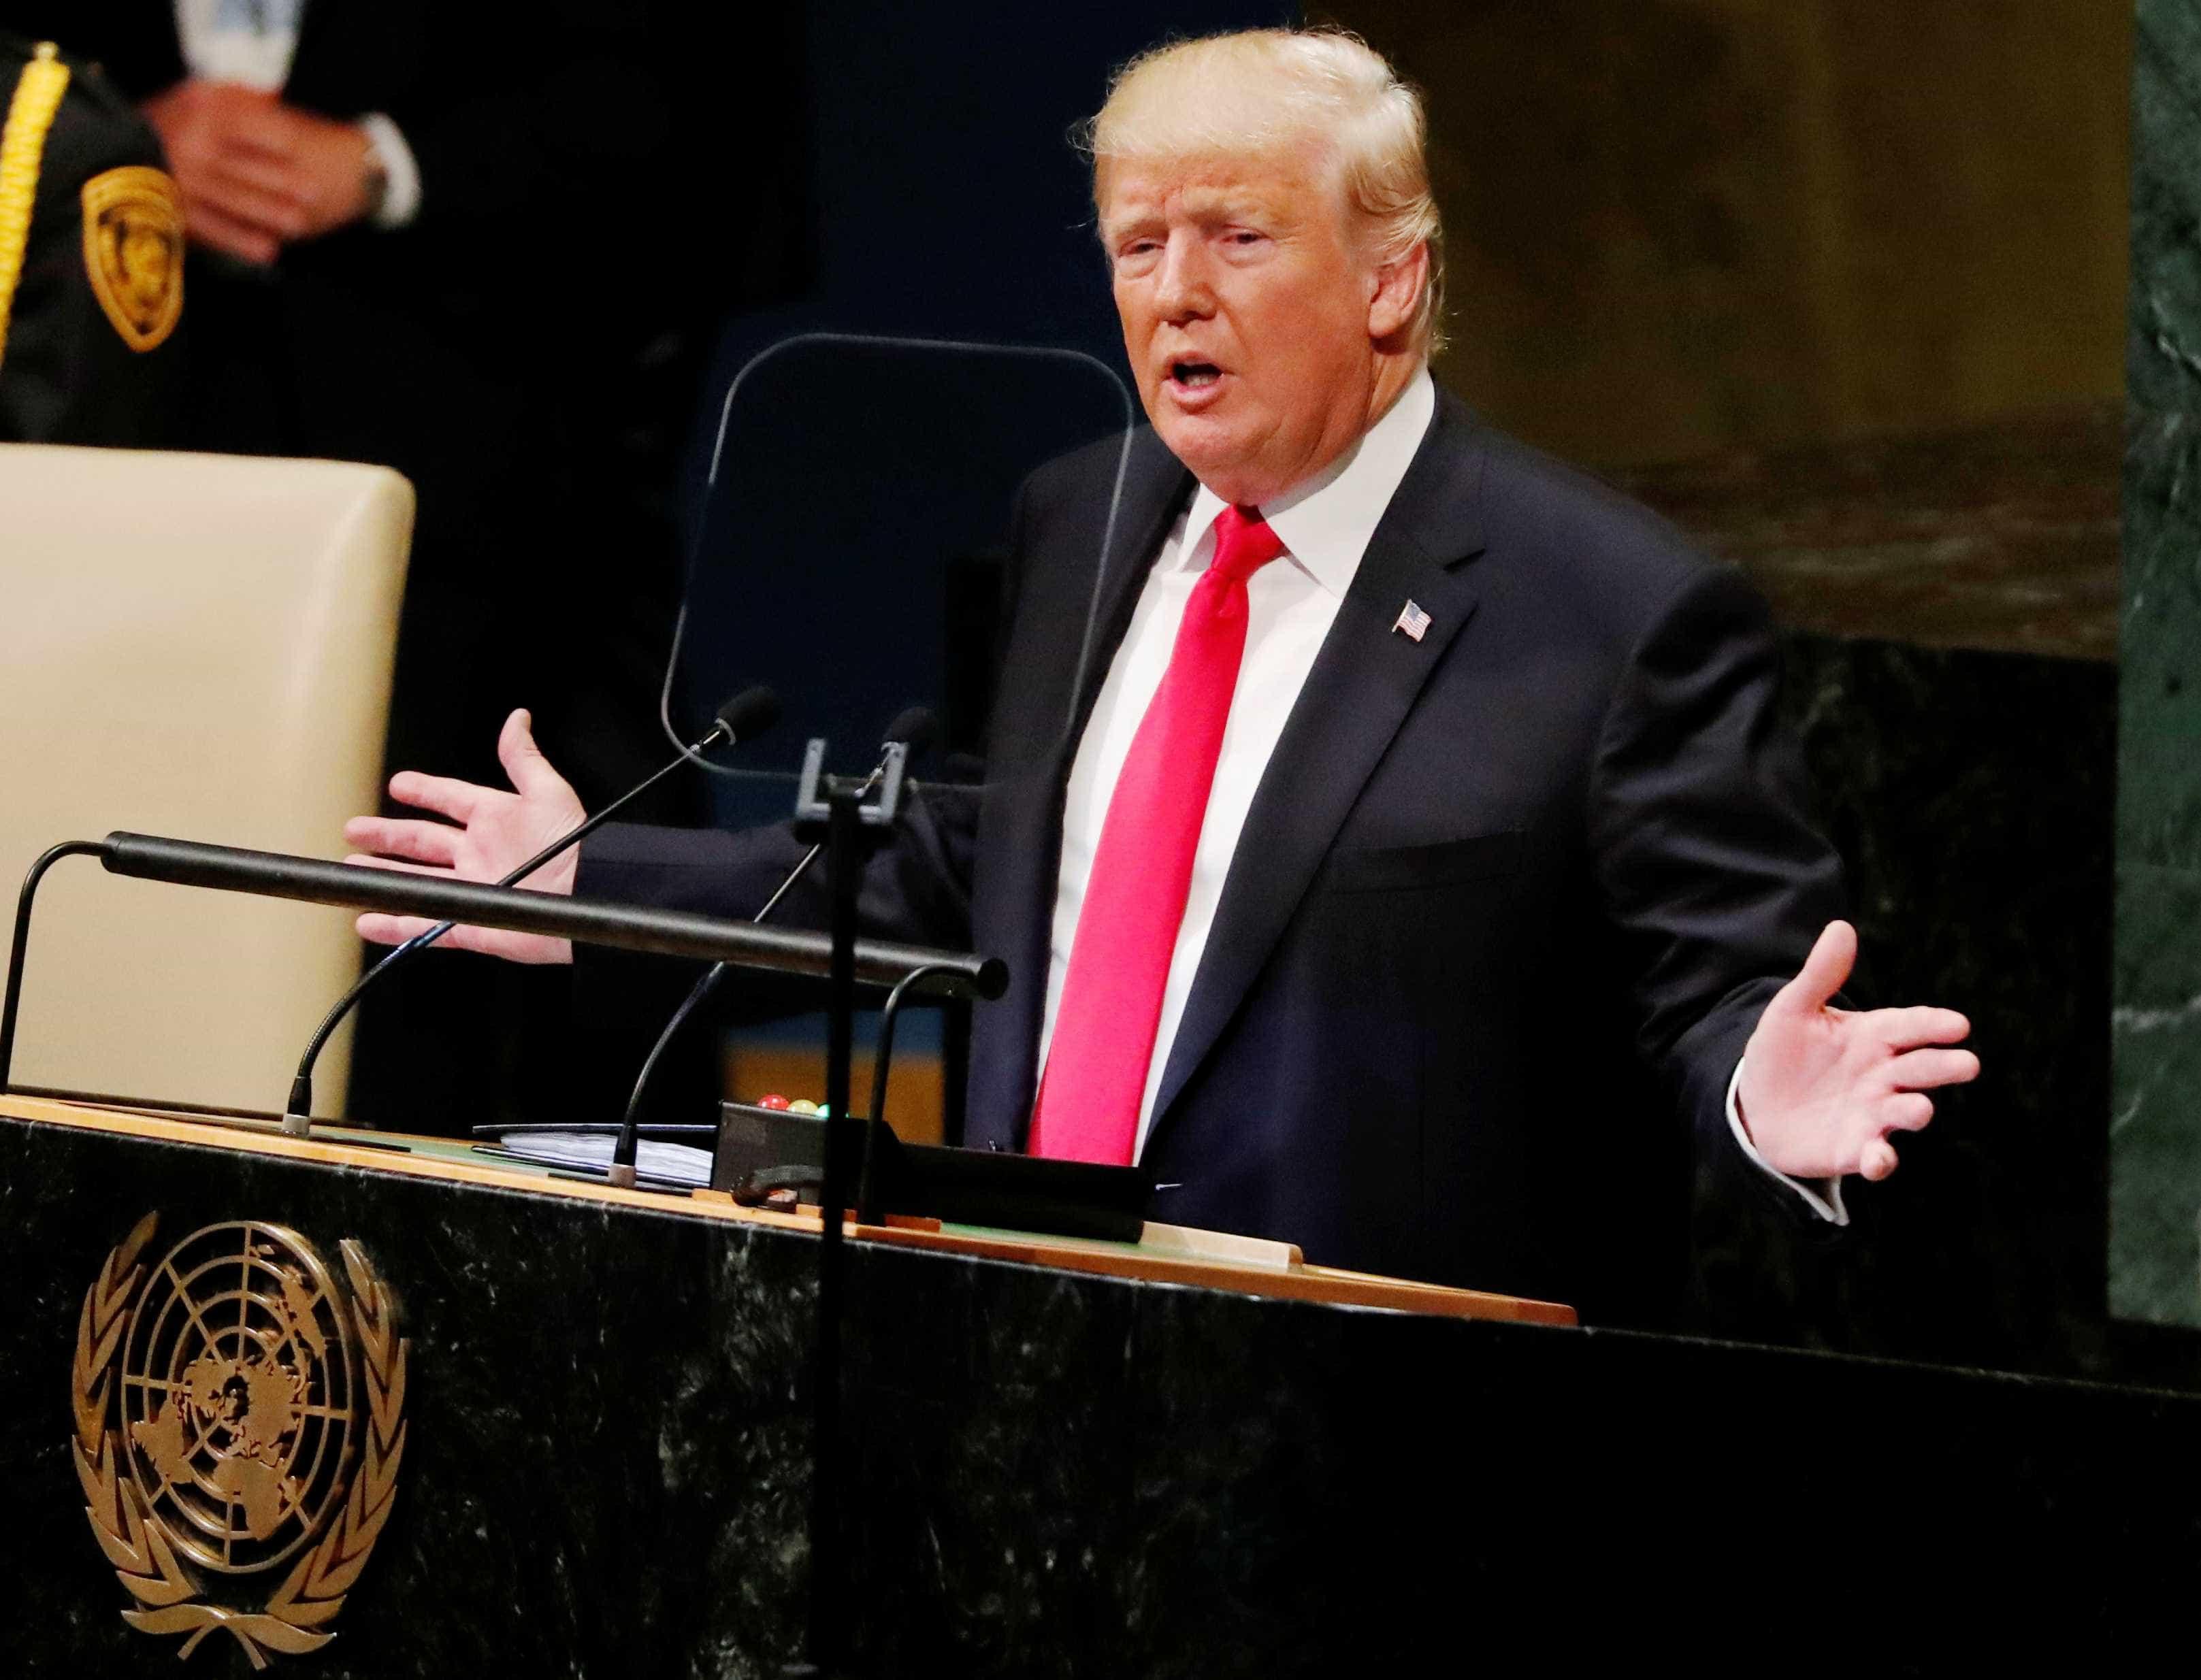 Após atraso, Trump faz discurso nacionalista na ONU